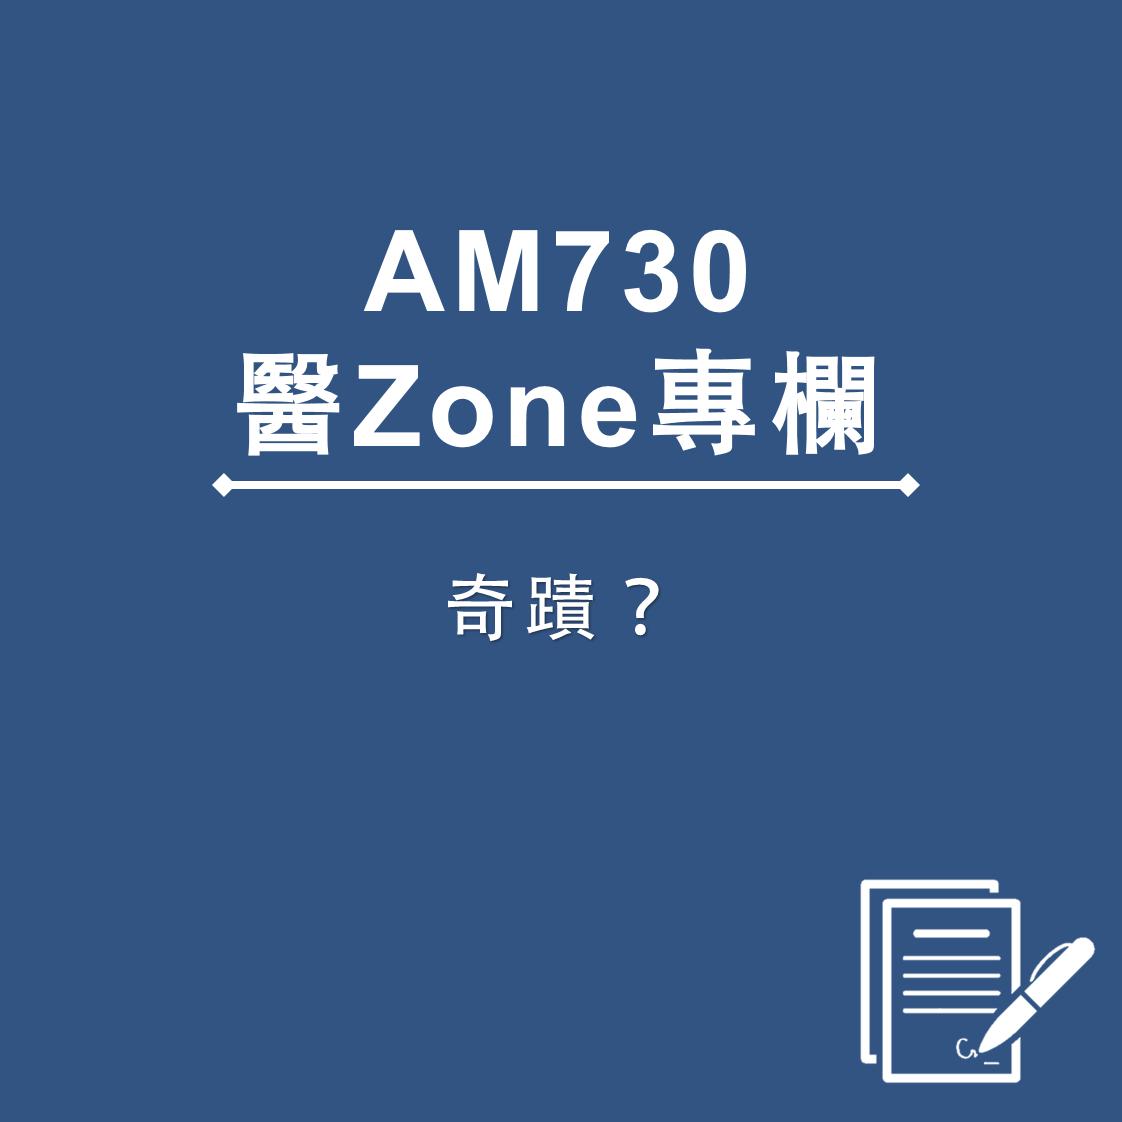 AM730 醫Zone 專欄 - 奇蹟?